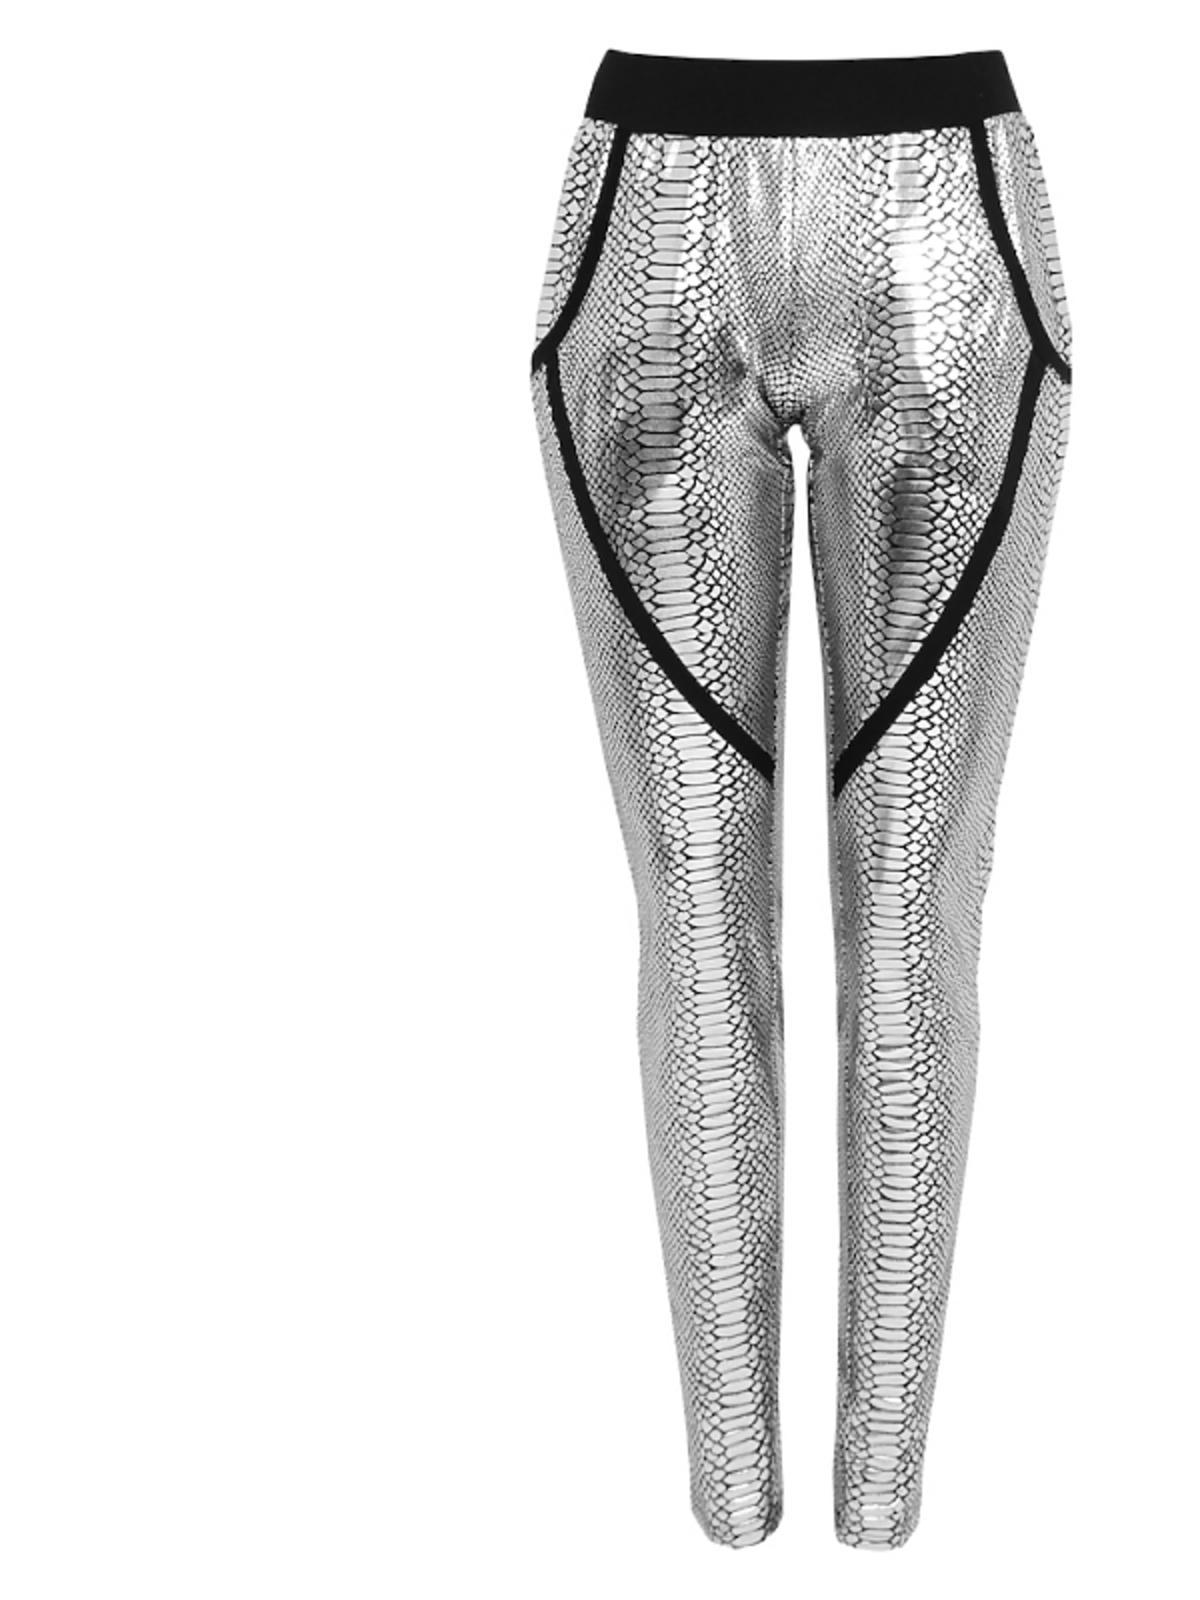 srebrne legginsy